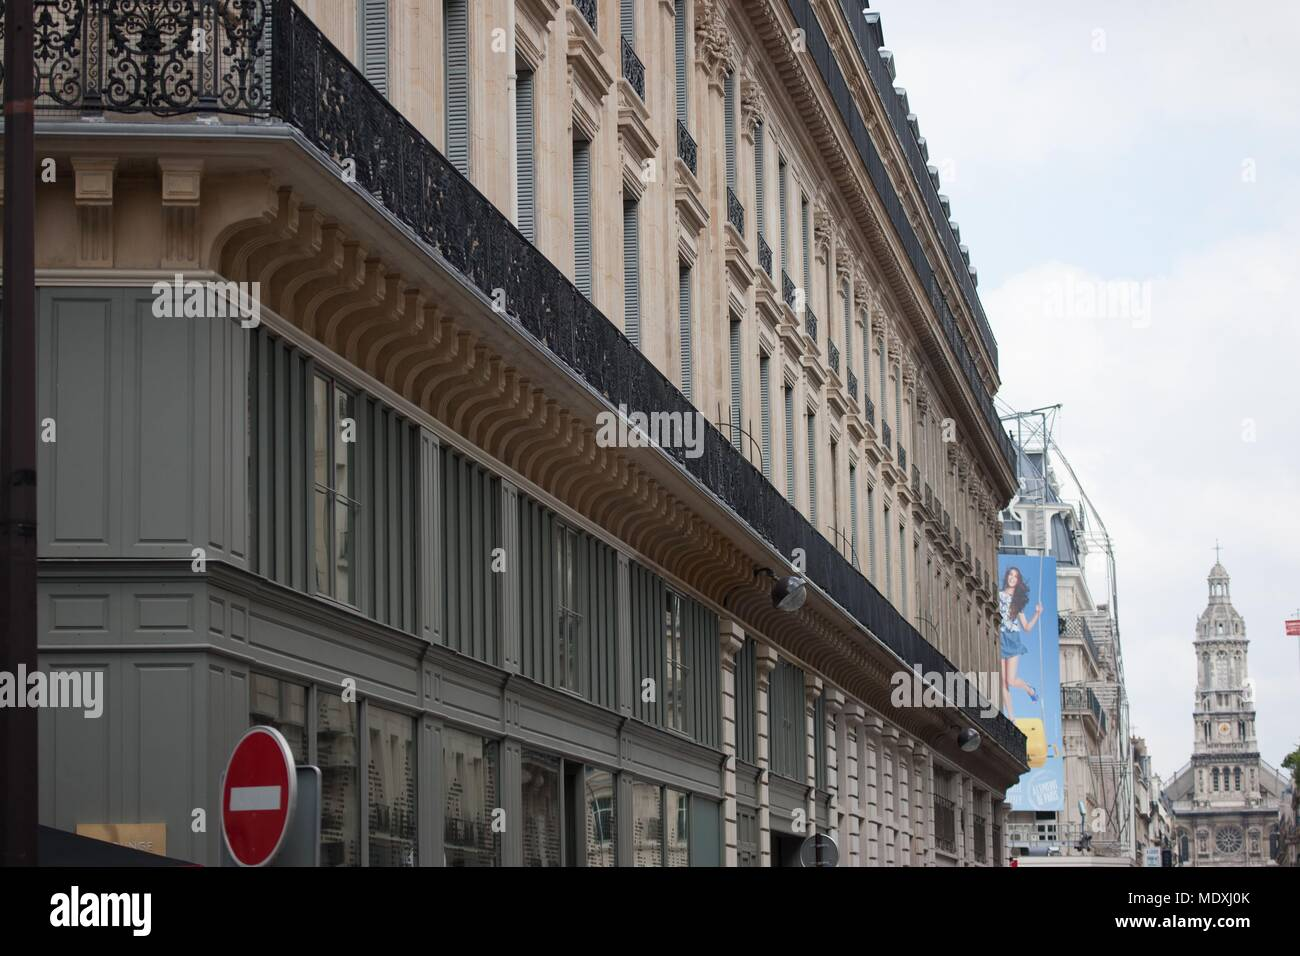 Paris, 9th arrondissement, rue de la Chaussee d'Antin, angle of the rue Meyerbeer, facades, balcony, - Stock Image